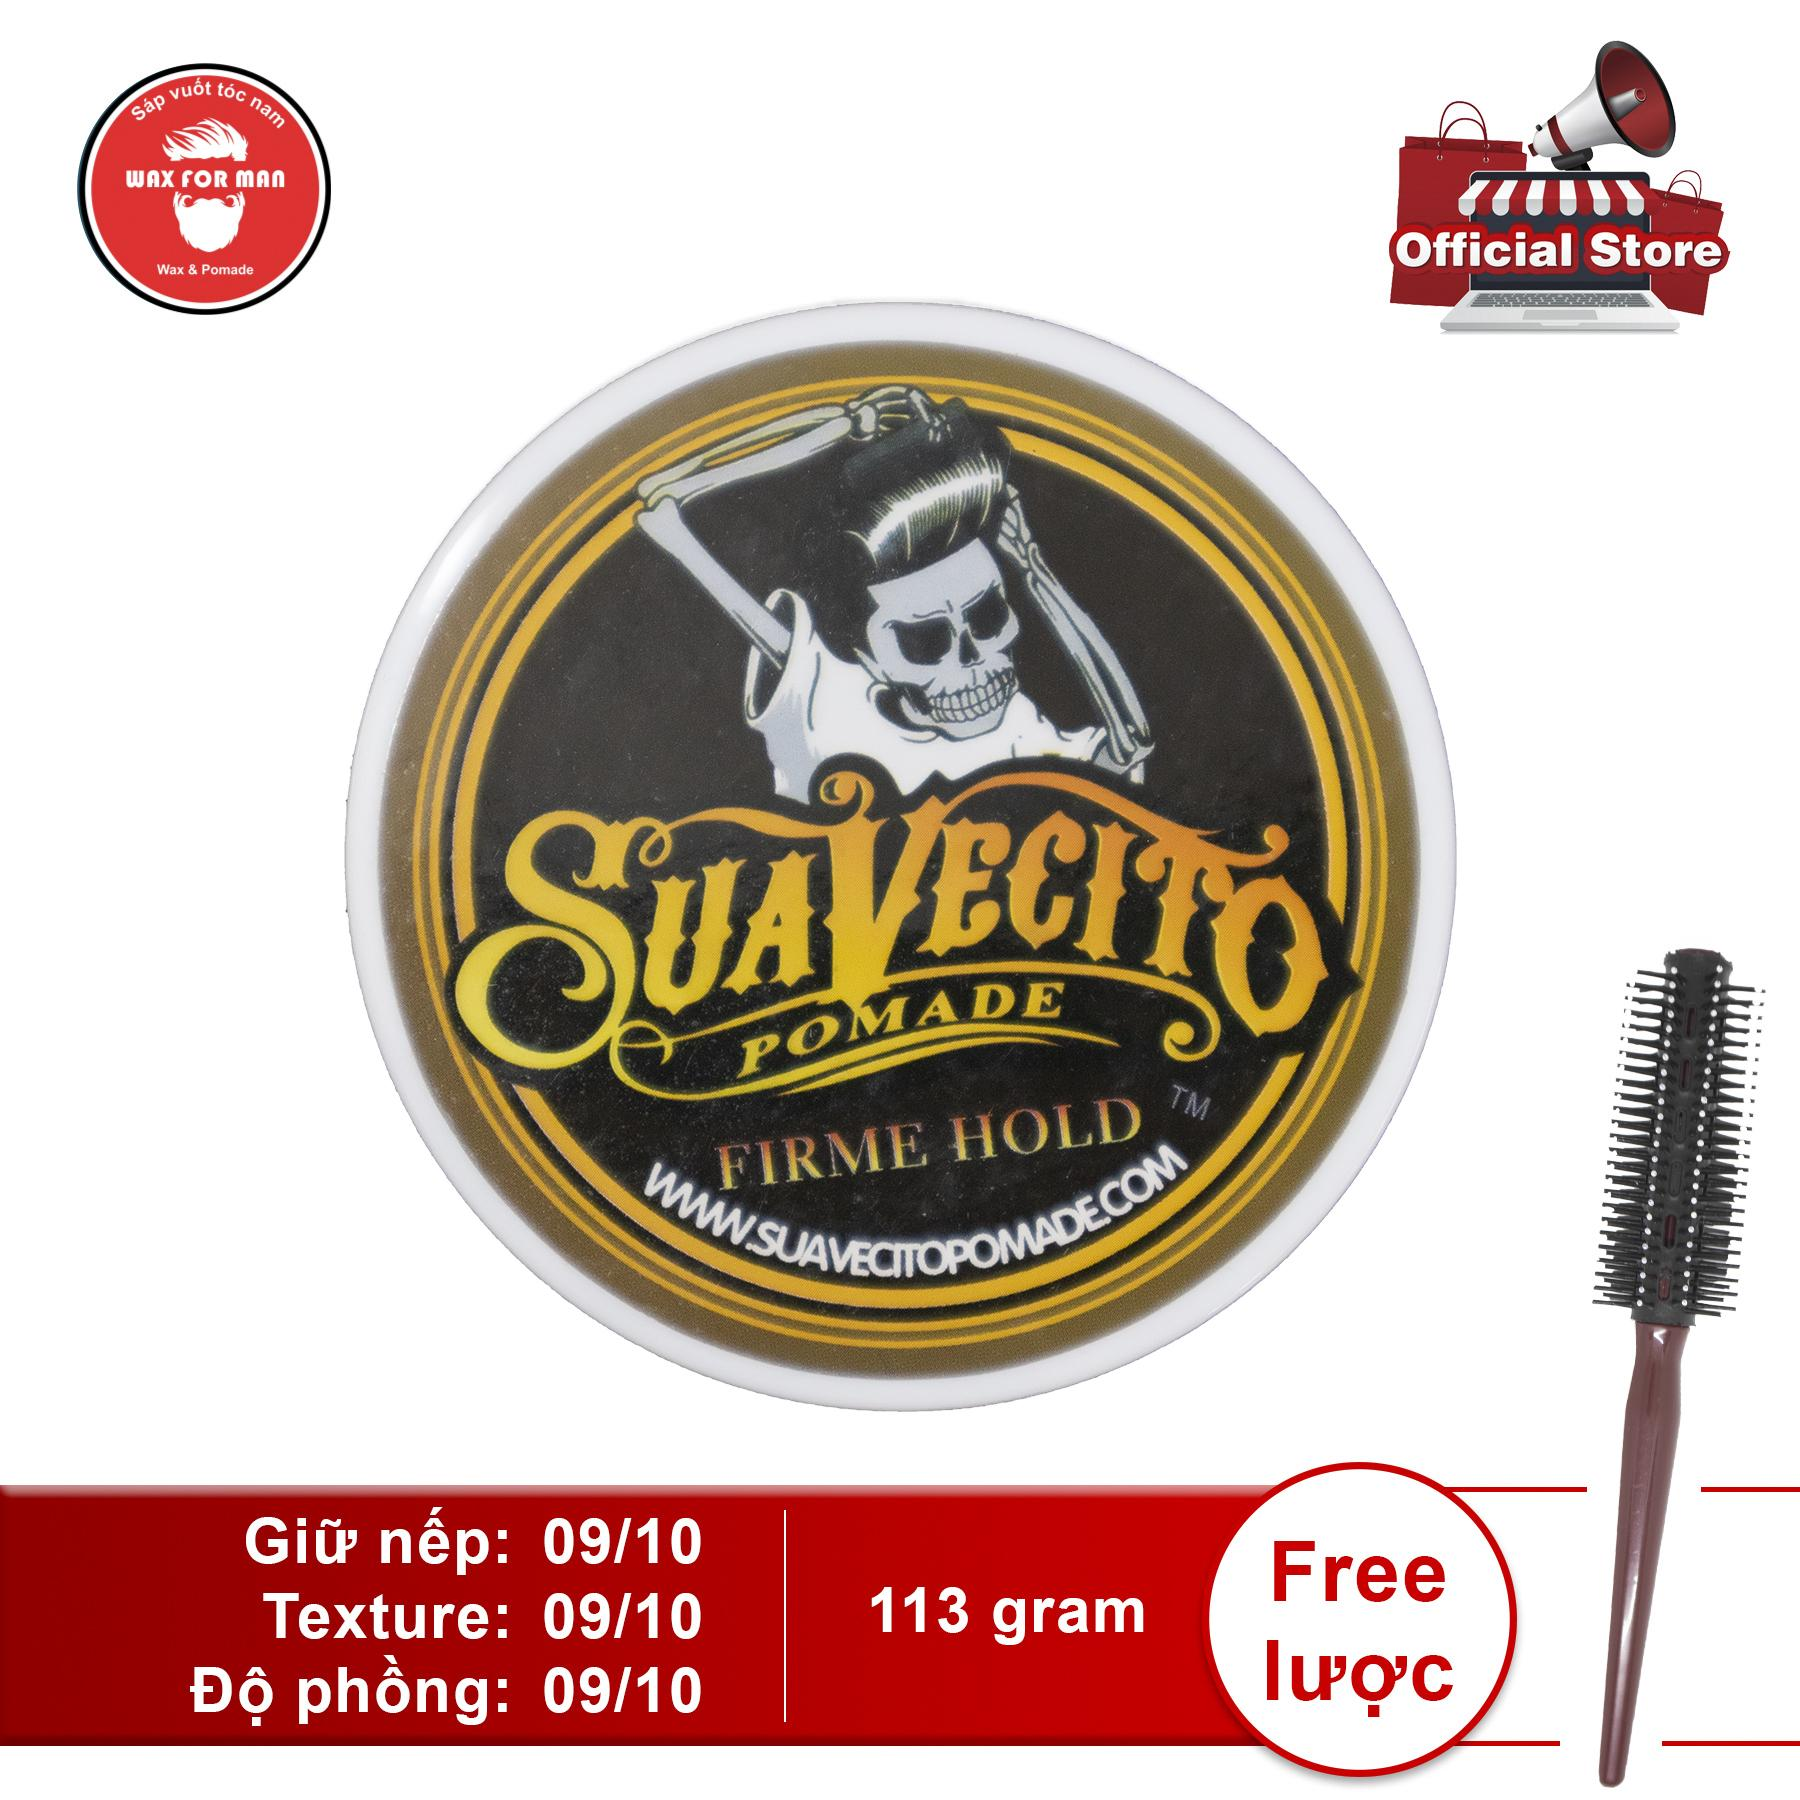 Sáp vuốt tóc Suavecito Firme Hold Pomade chính hãng